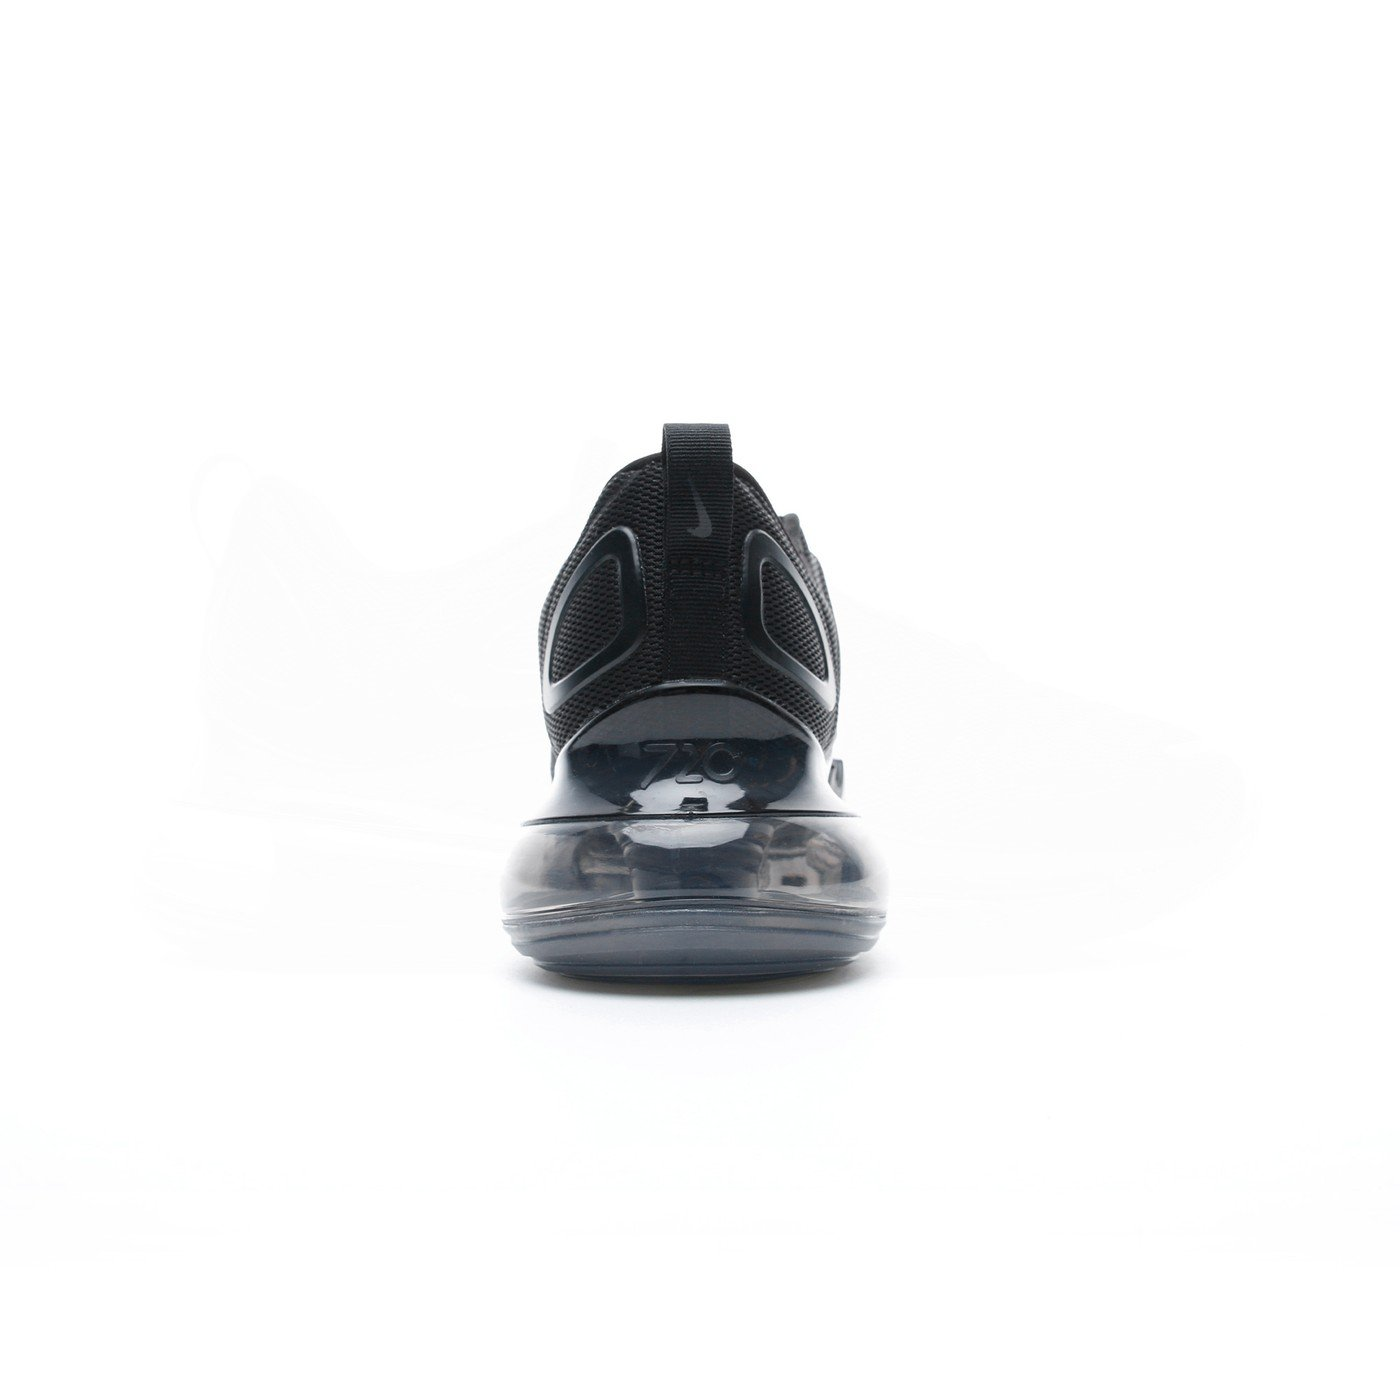 Nike Air Max 720 Kadın Siyah Spor Ayakkabı